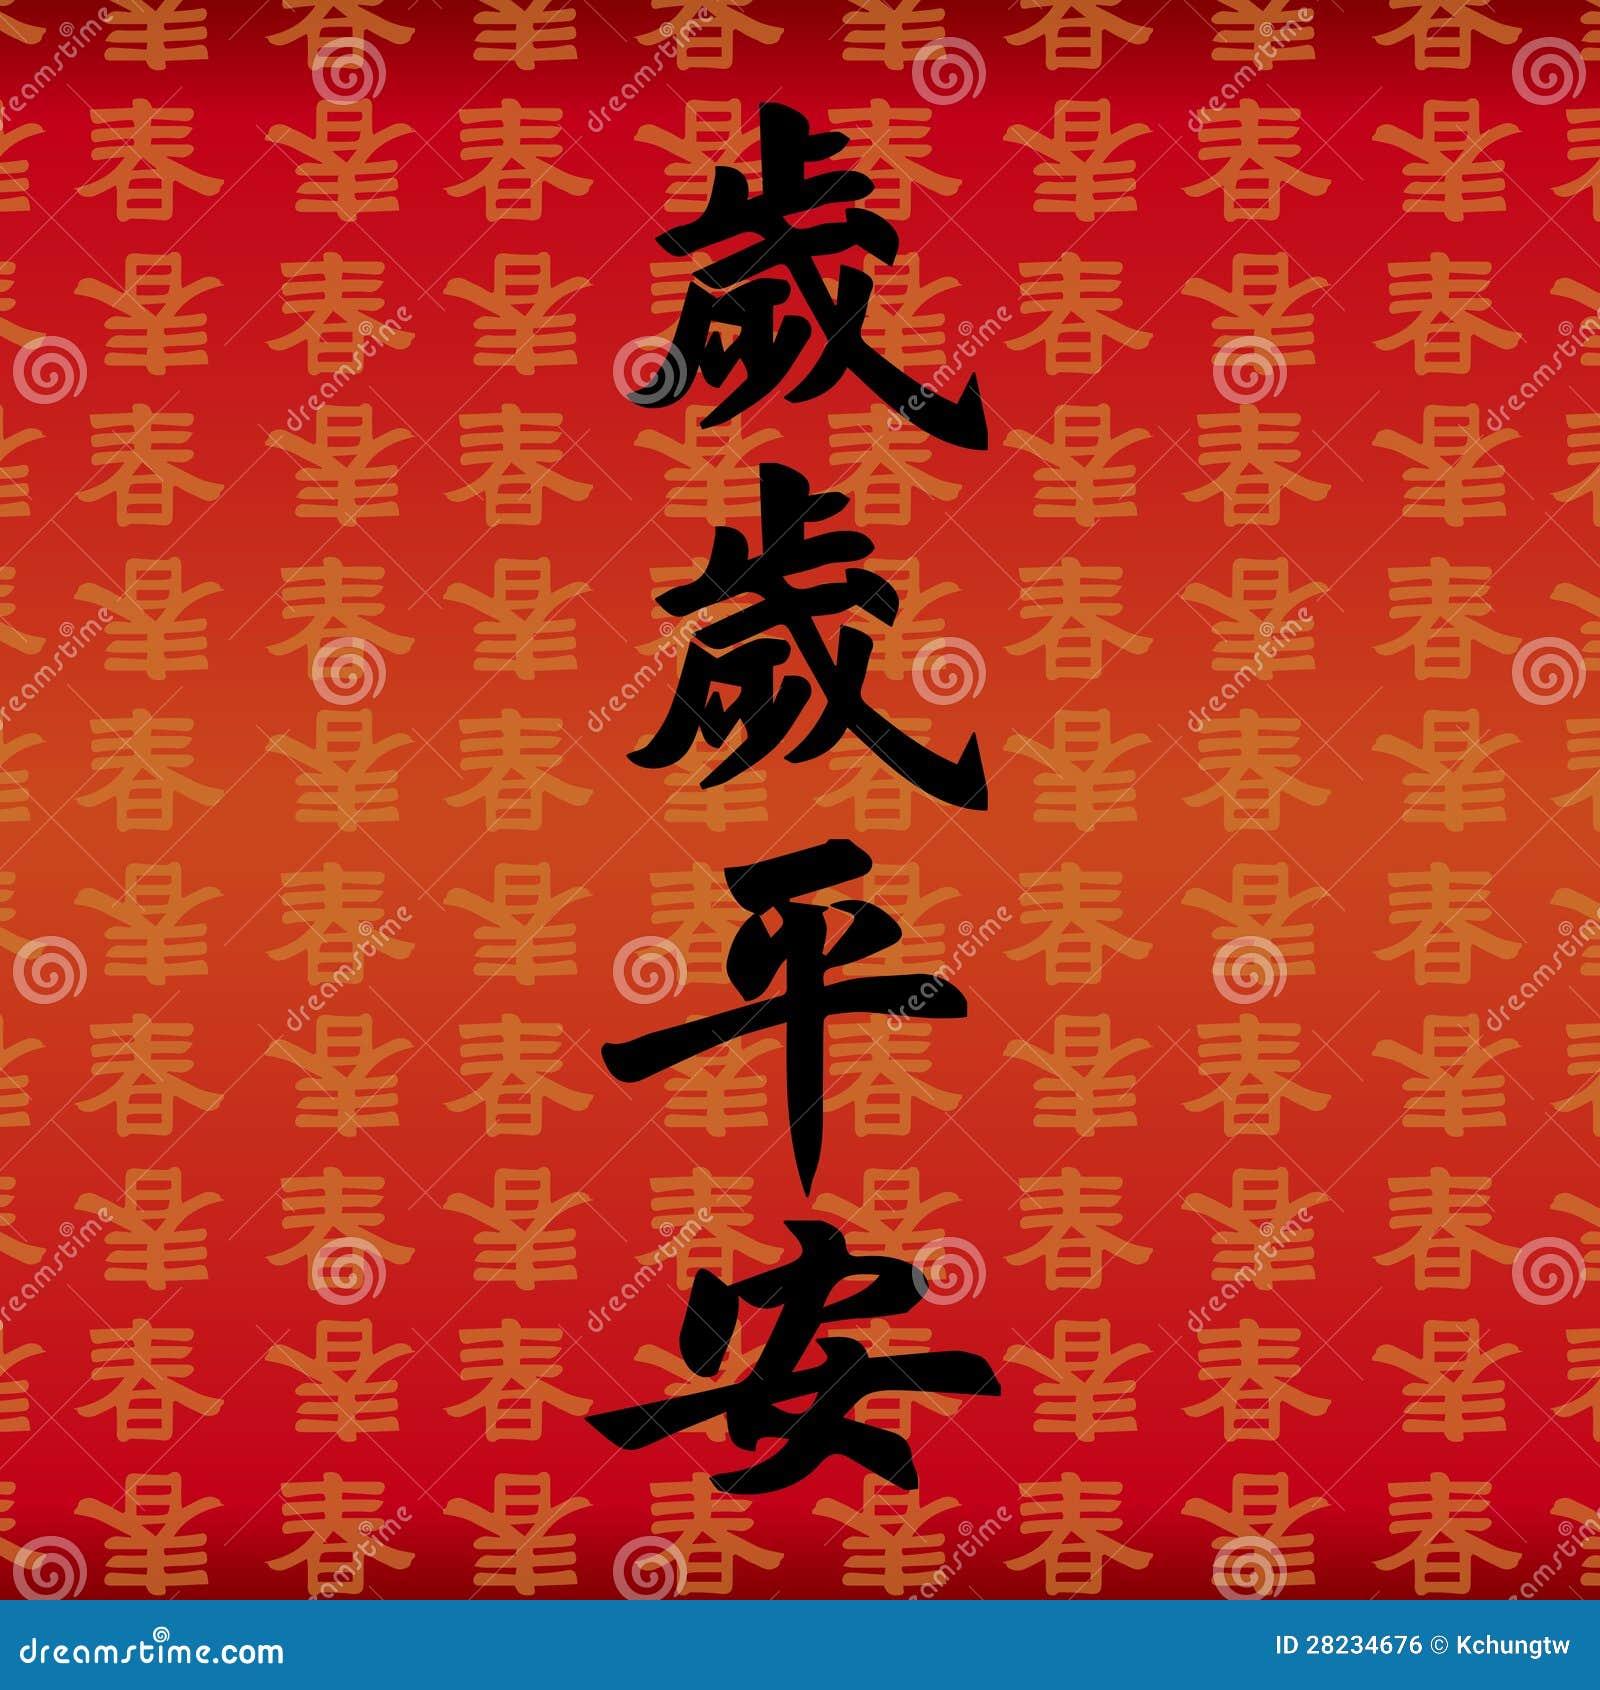 chinesische gutes gl ck symbole lizenzfreies stockbild bild 28234676. Black Bedroom Furniture Sets. Home Design Ideas